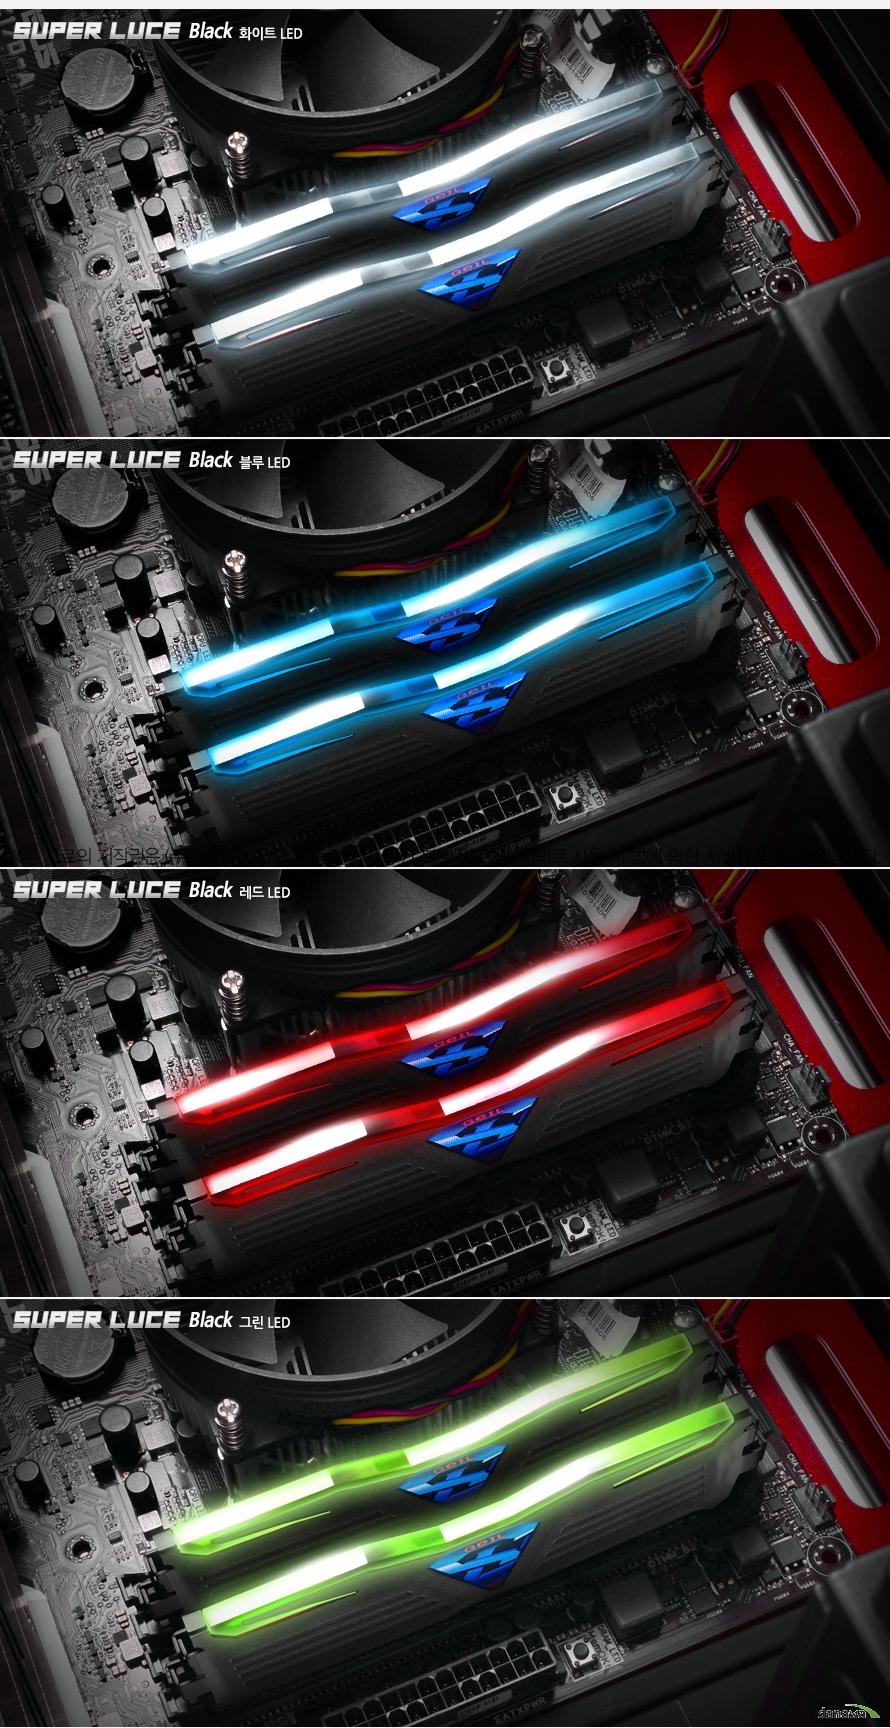 GeIL DDR4 SUPER LUCE Black